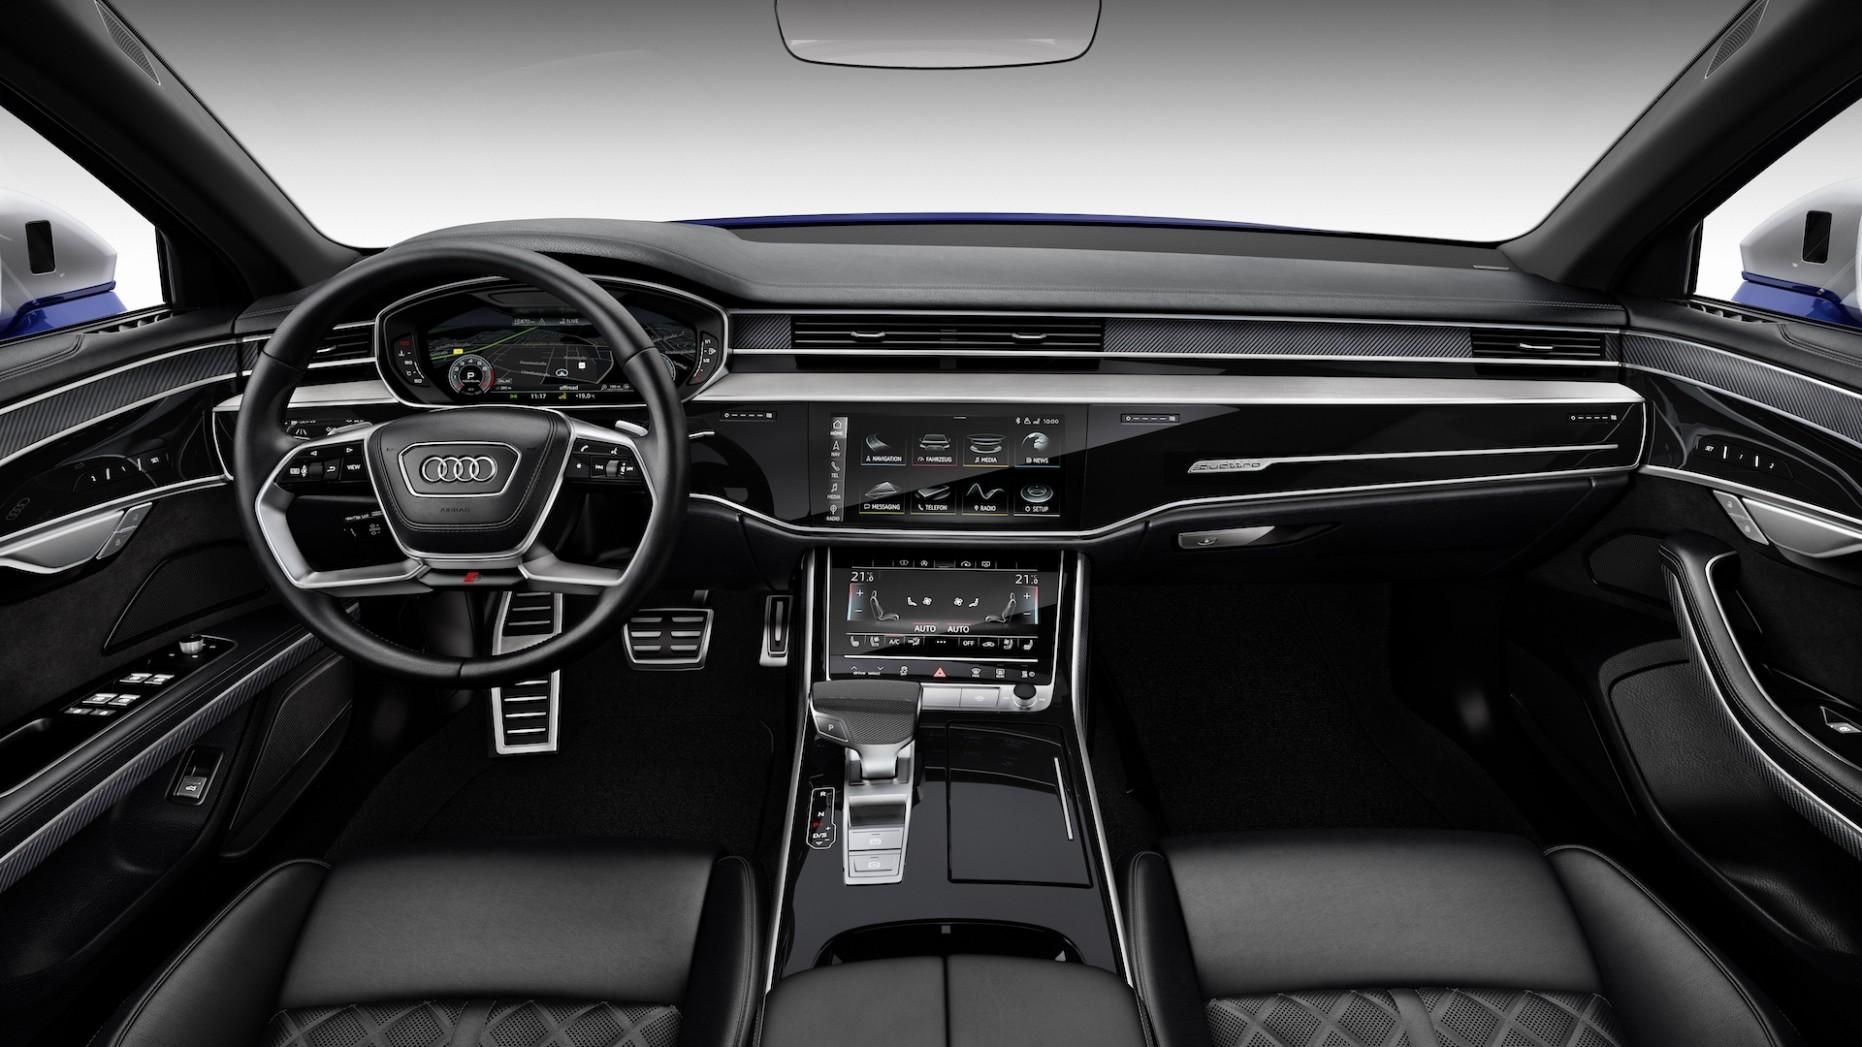 Understated 3-horsepower 3 Audi S3 will set you back $3,3 - Audi S8 2021